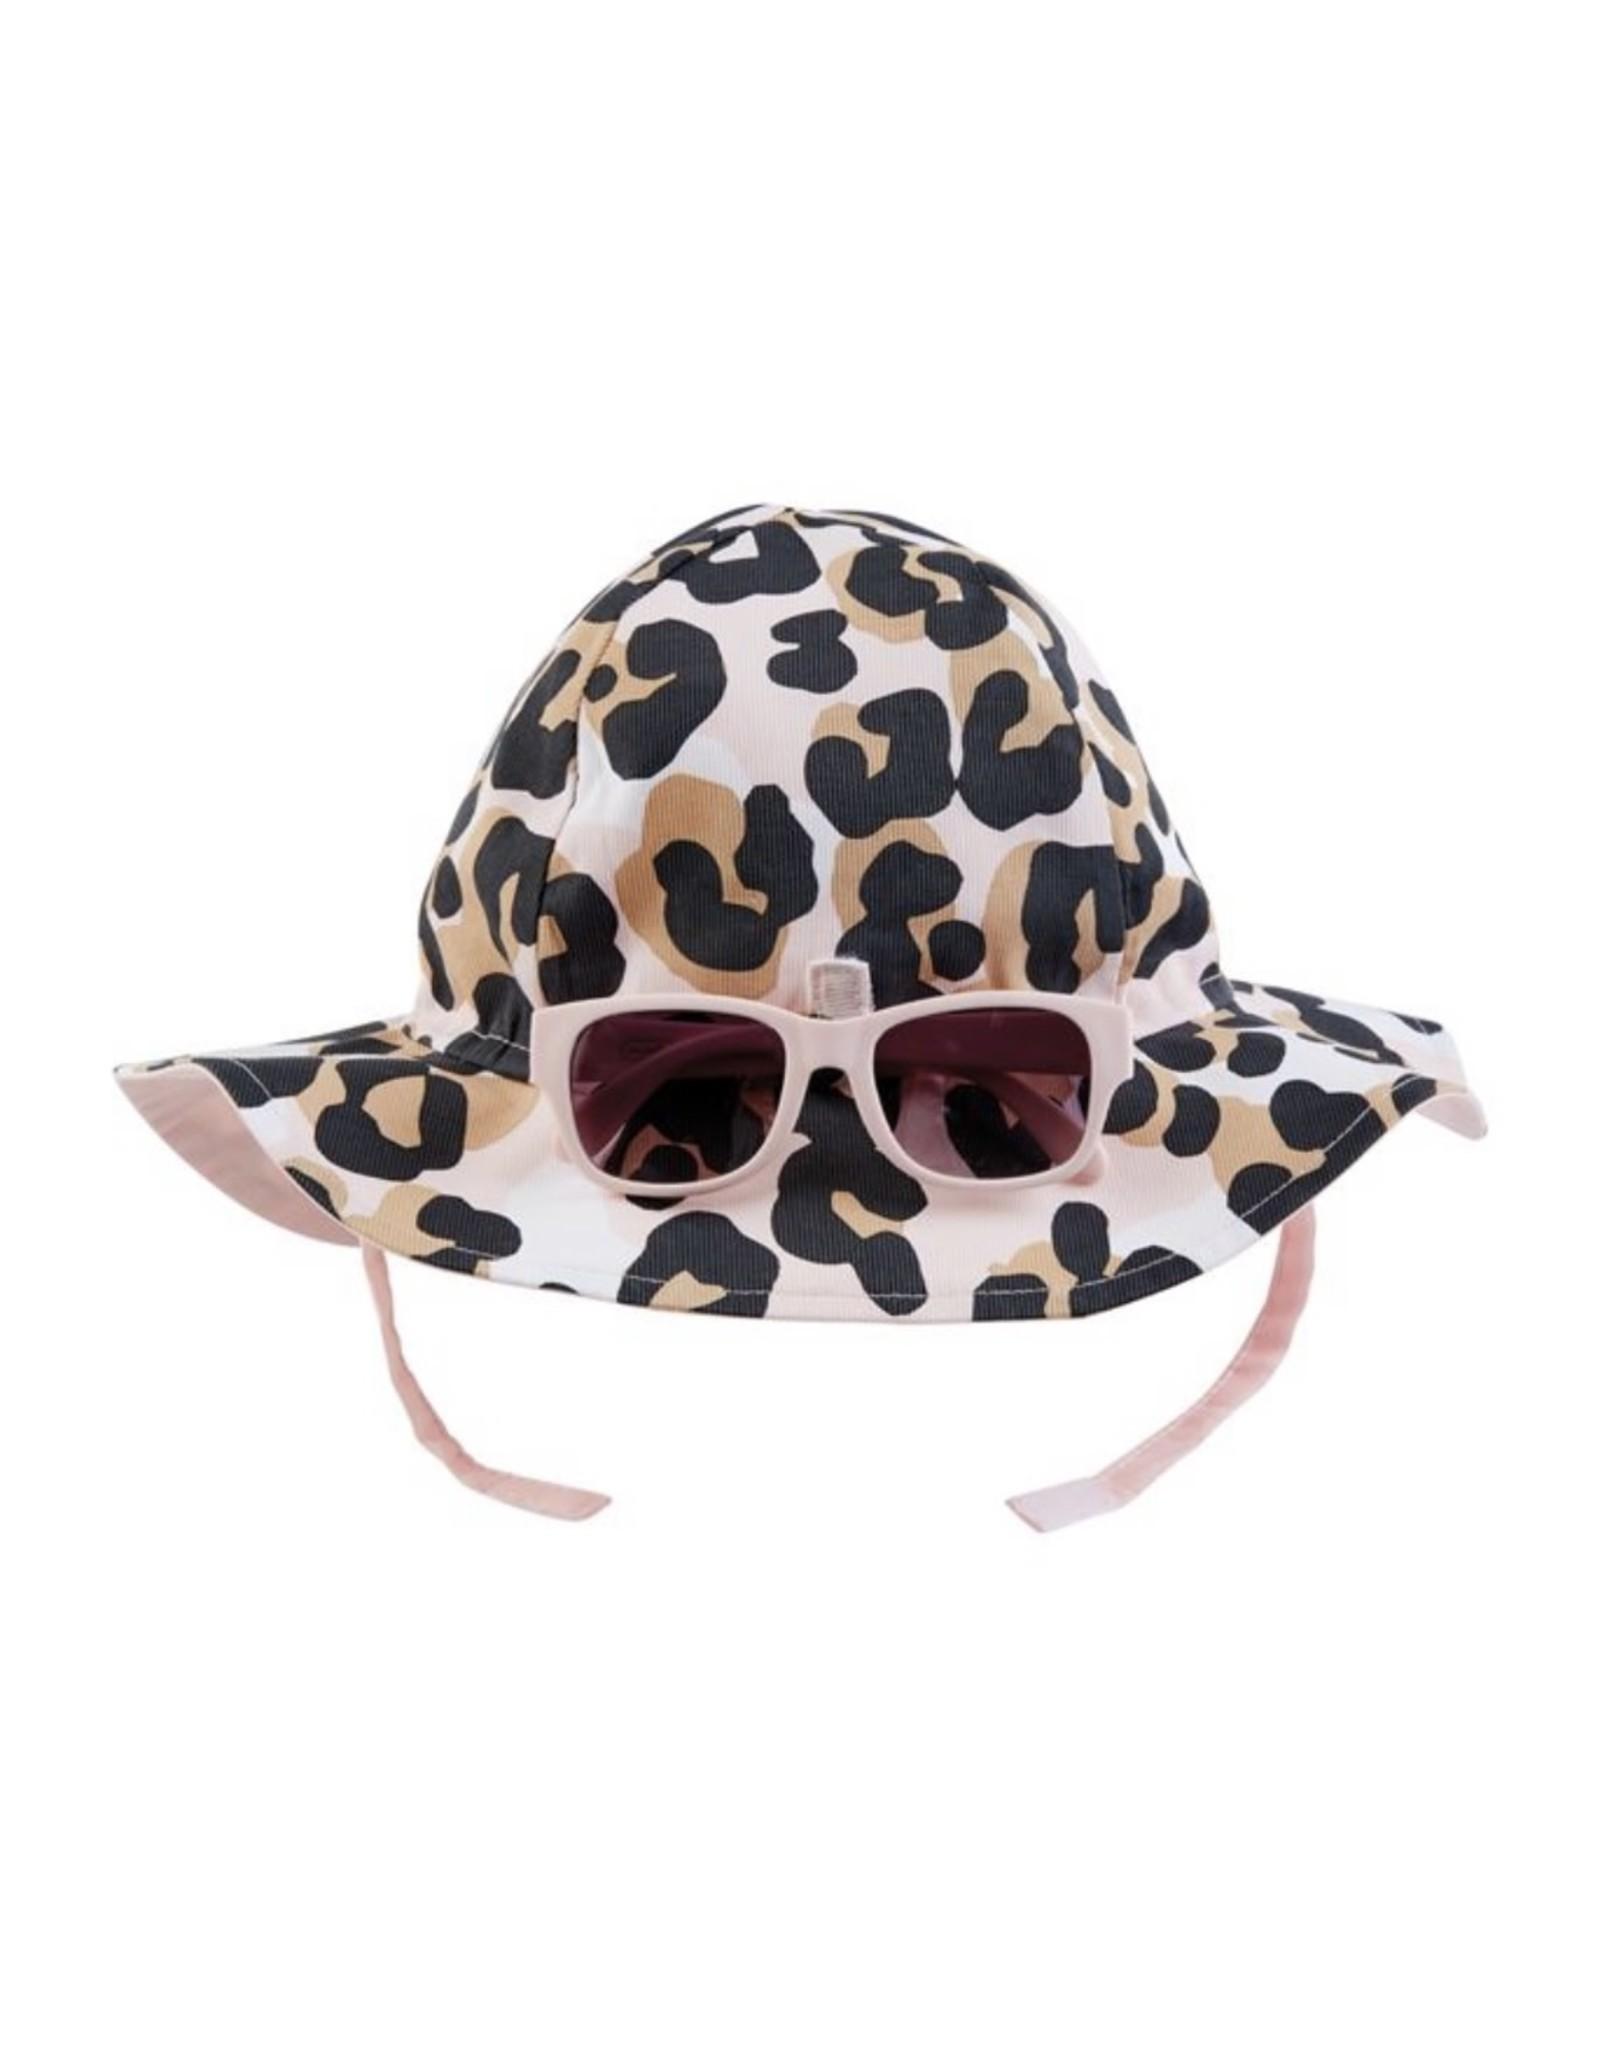 Mudpie Mud Pie- Leopard Sun Hat & Glasses 6-18M